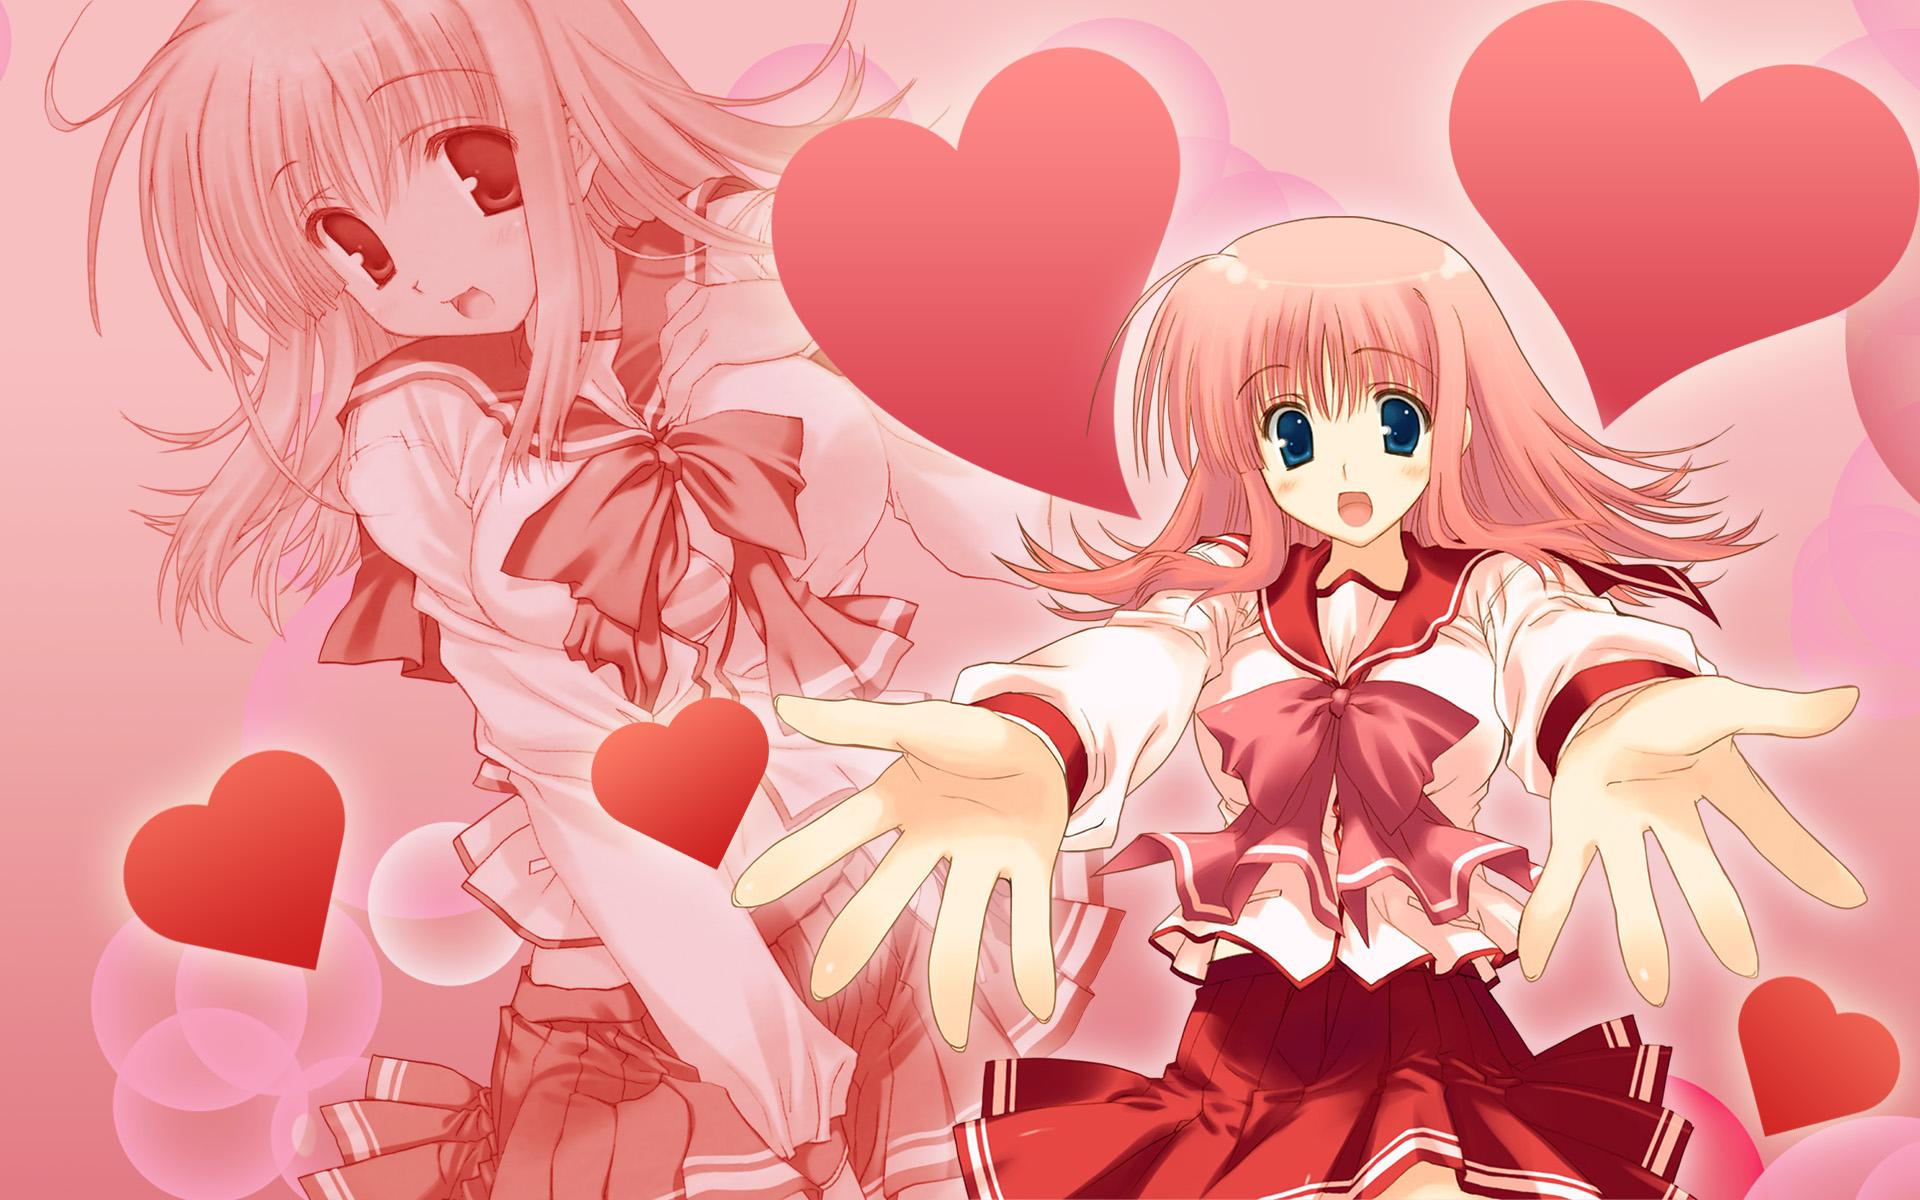 aquaplus kouno_harumi leaf mitsumi_misato pink school_uniform to_heart to_heart_2